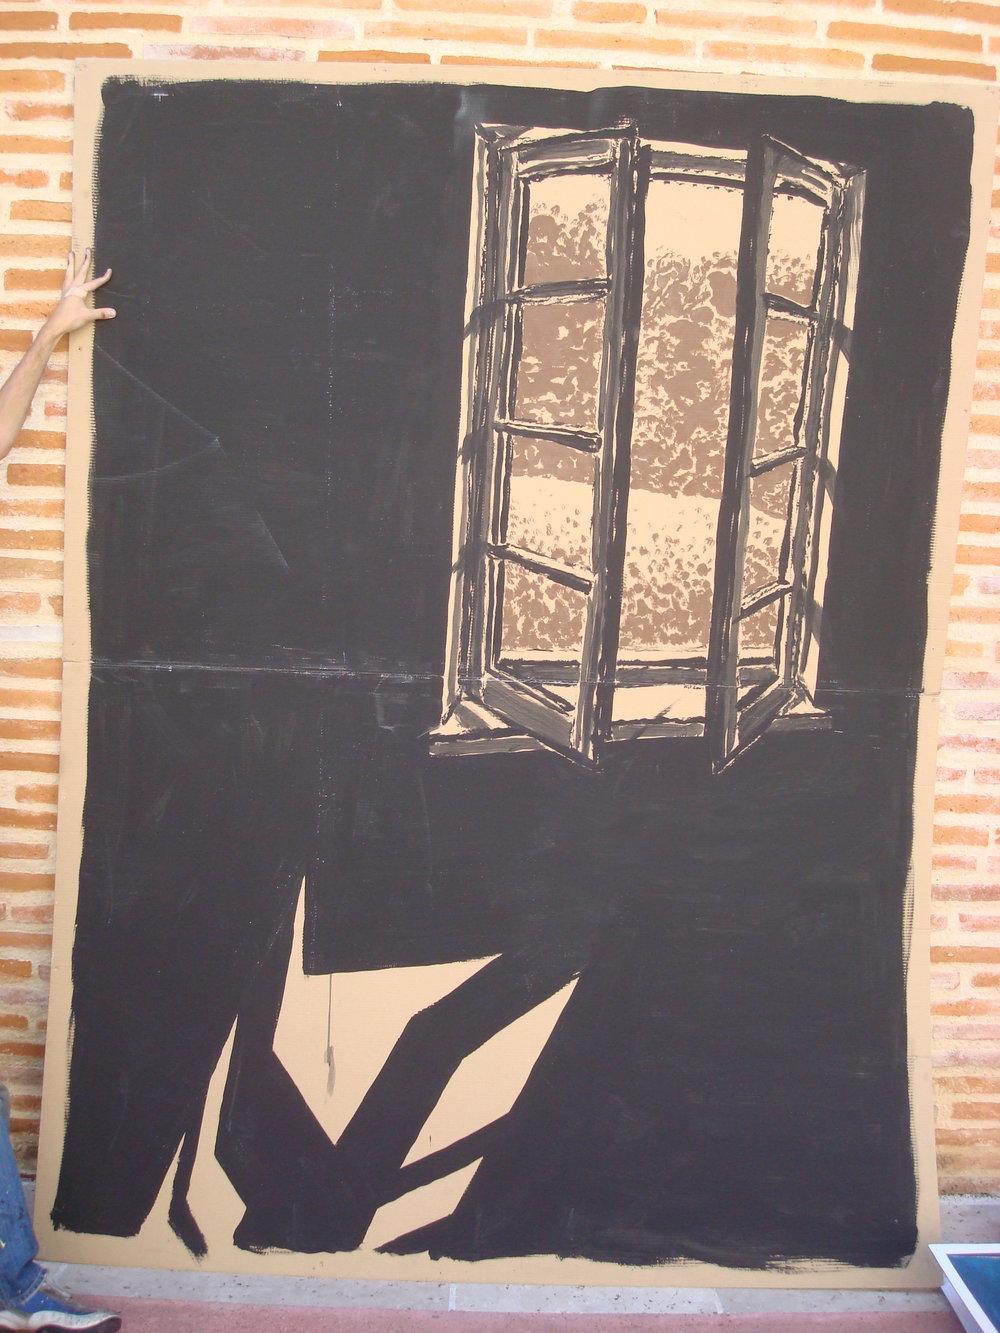 Window #322  Tempura paint on cardboard. 6 x 8 ft.